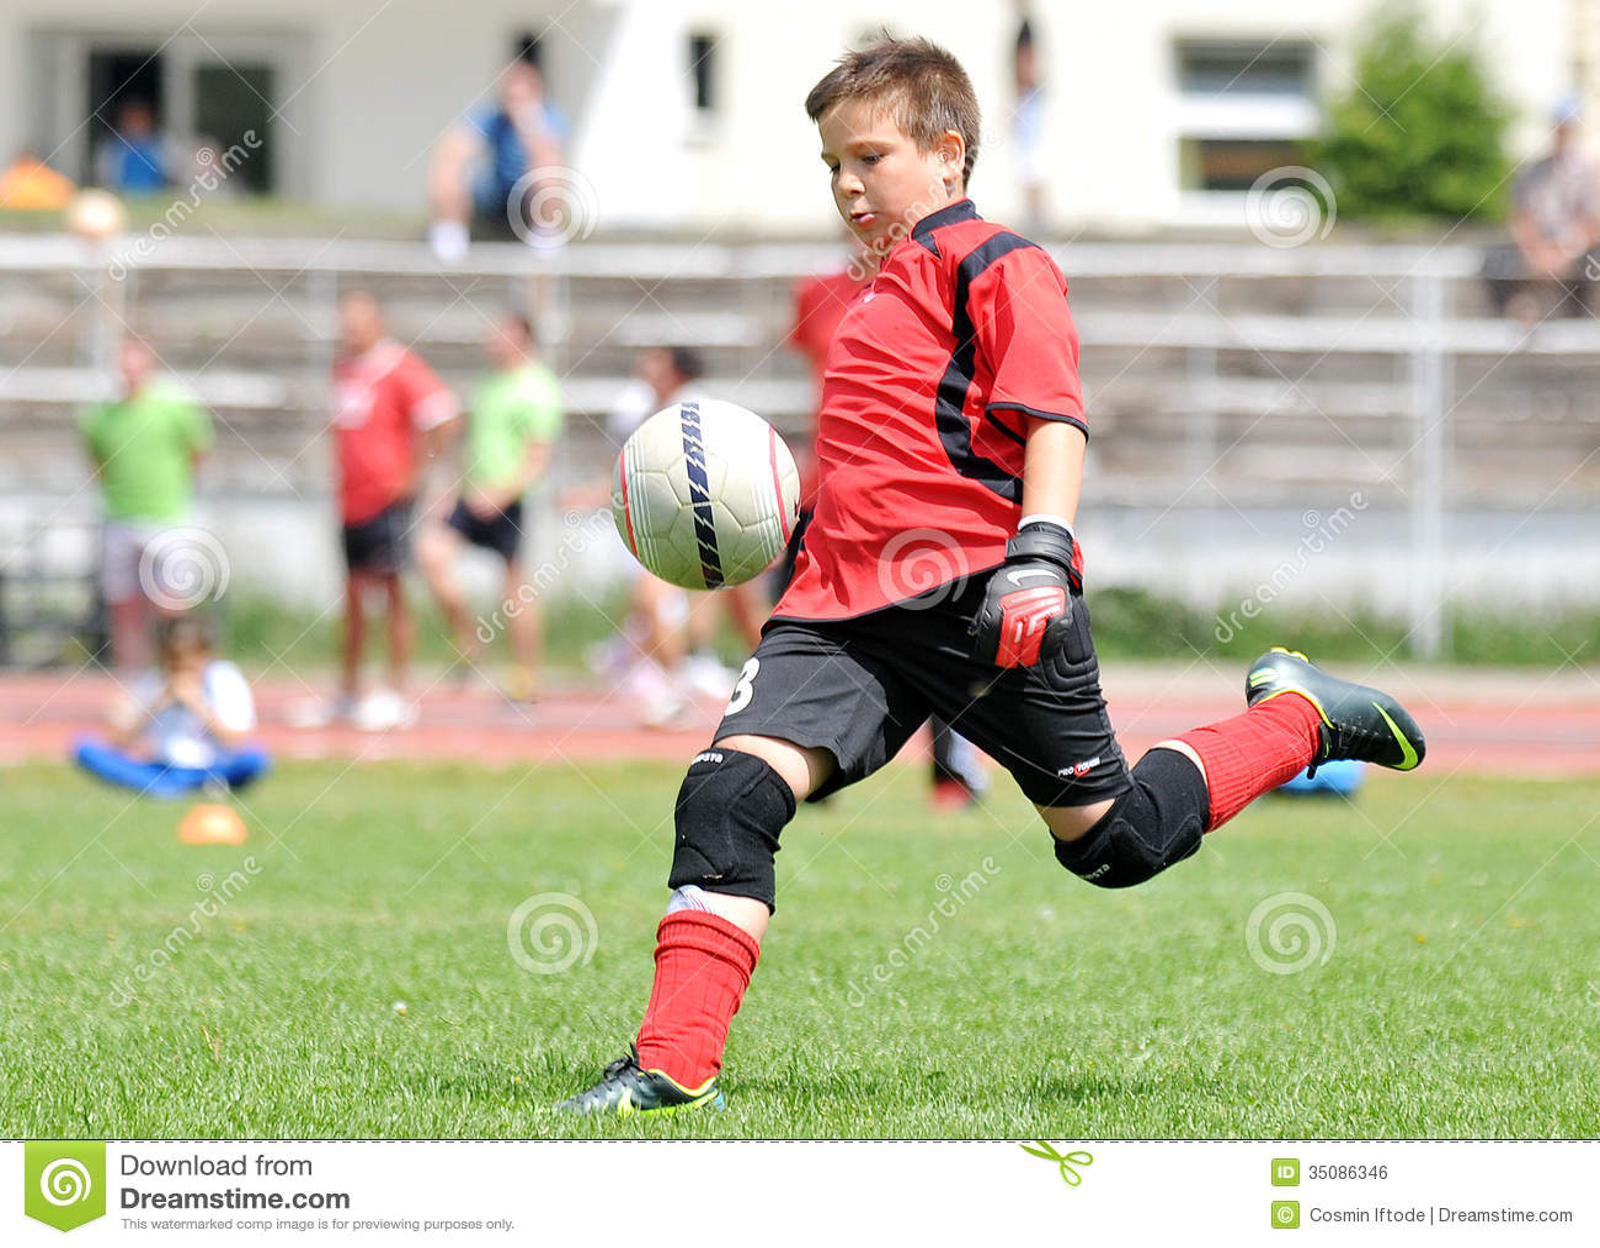 Young boy football or soccer goalkeeper